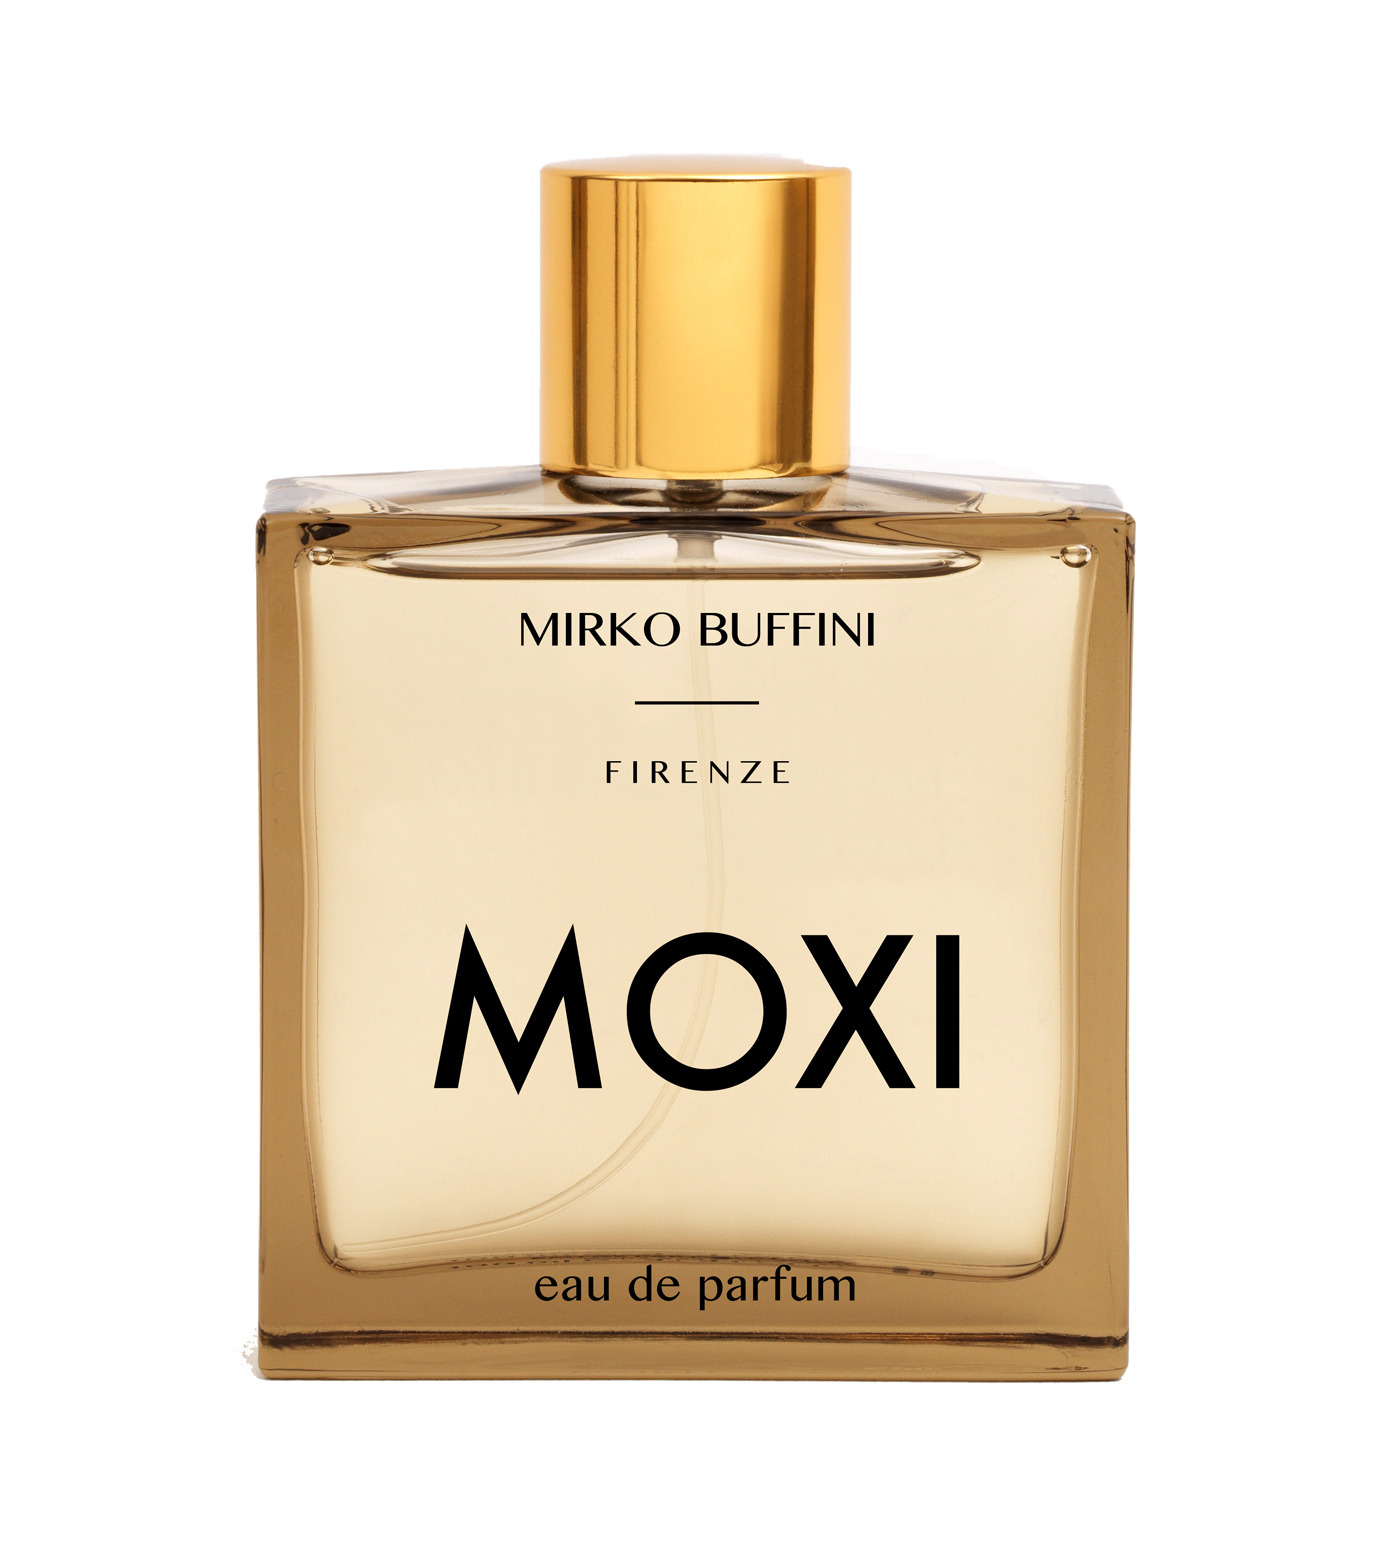 MIRKO BUFFINI(ミルコ・ブッフィーニ)のMOXI 30ml-GOLD(フレグランス/fragrance)-MB-10023-2 拡大詳細画像1